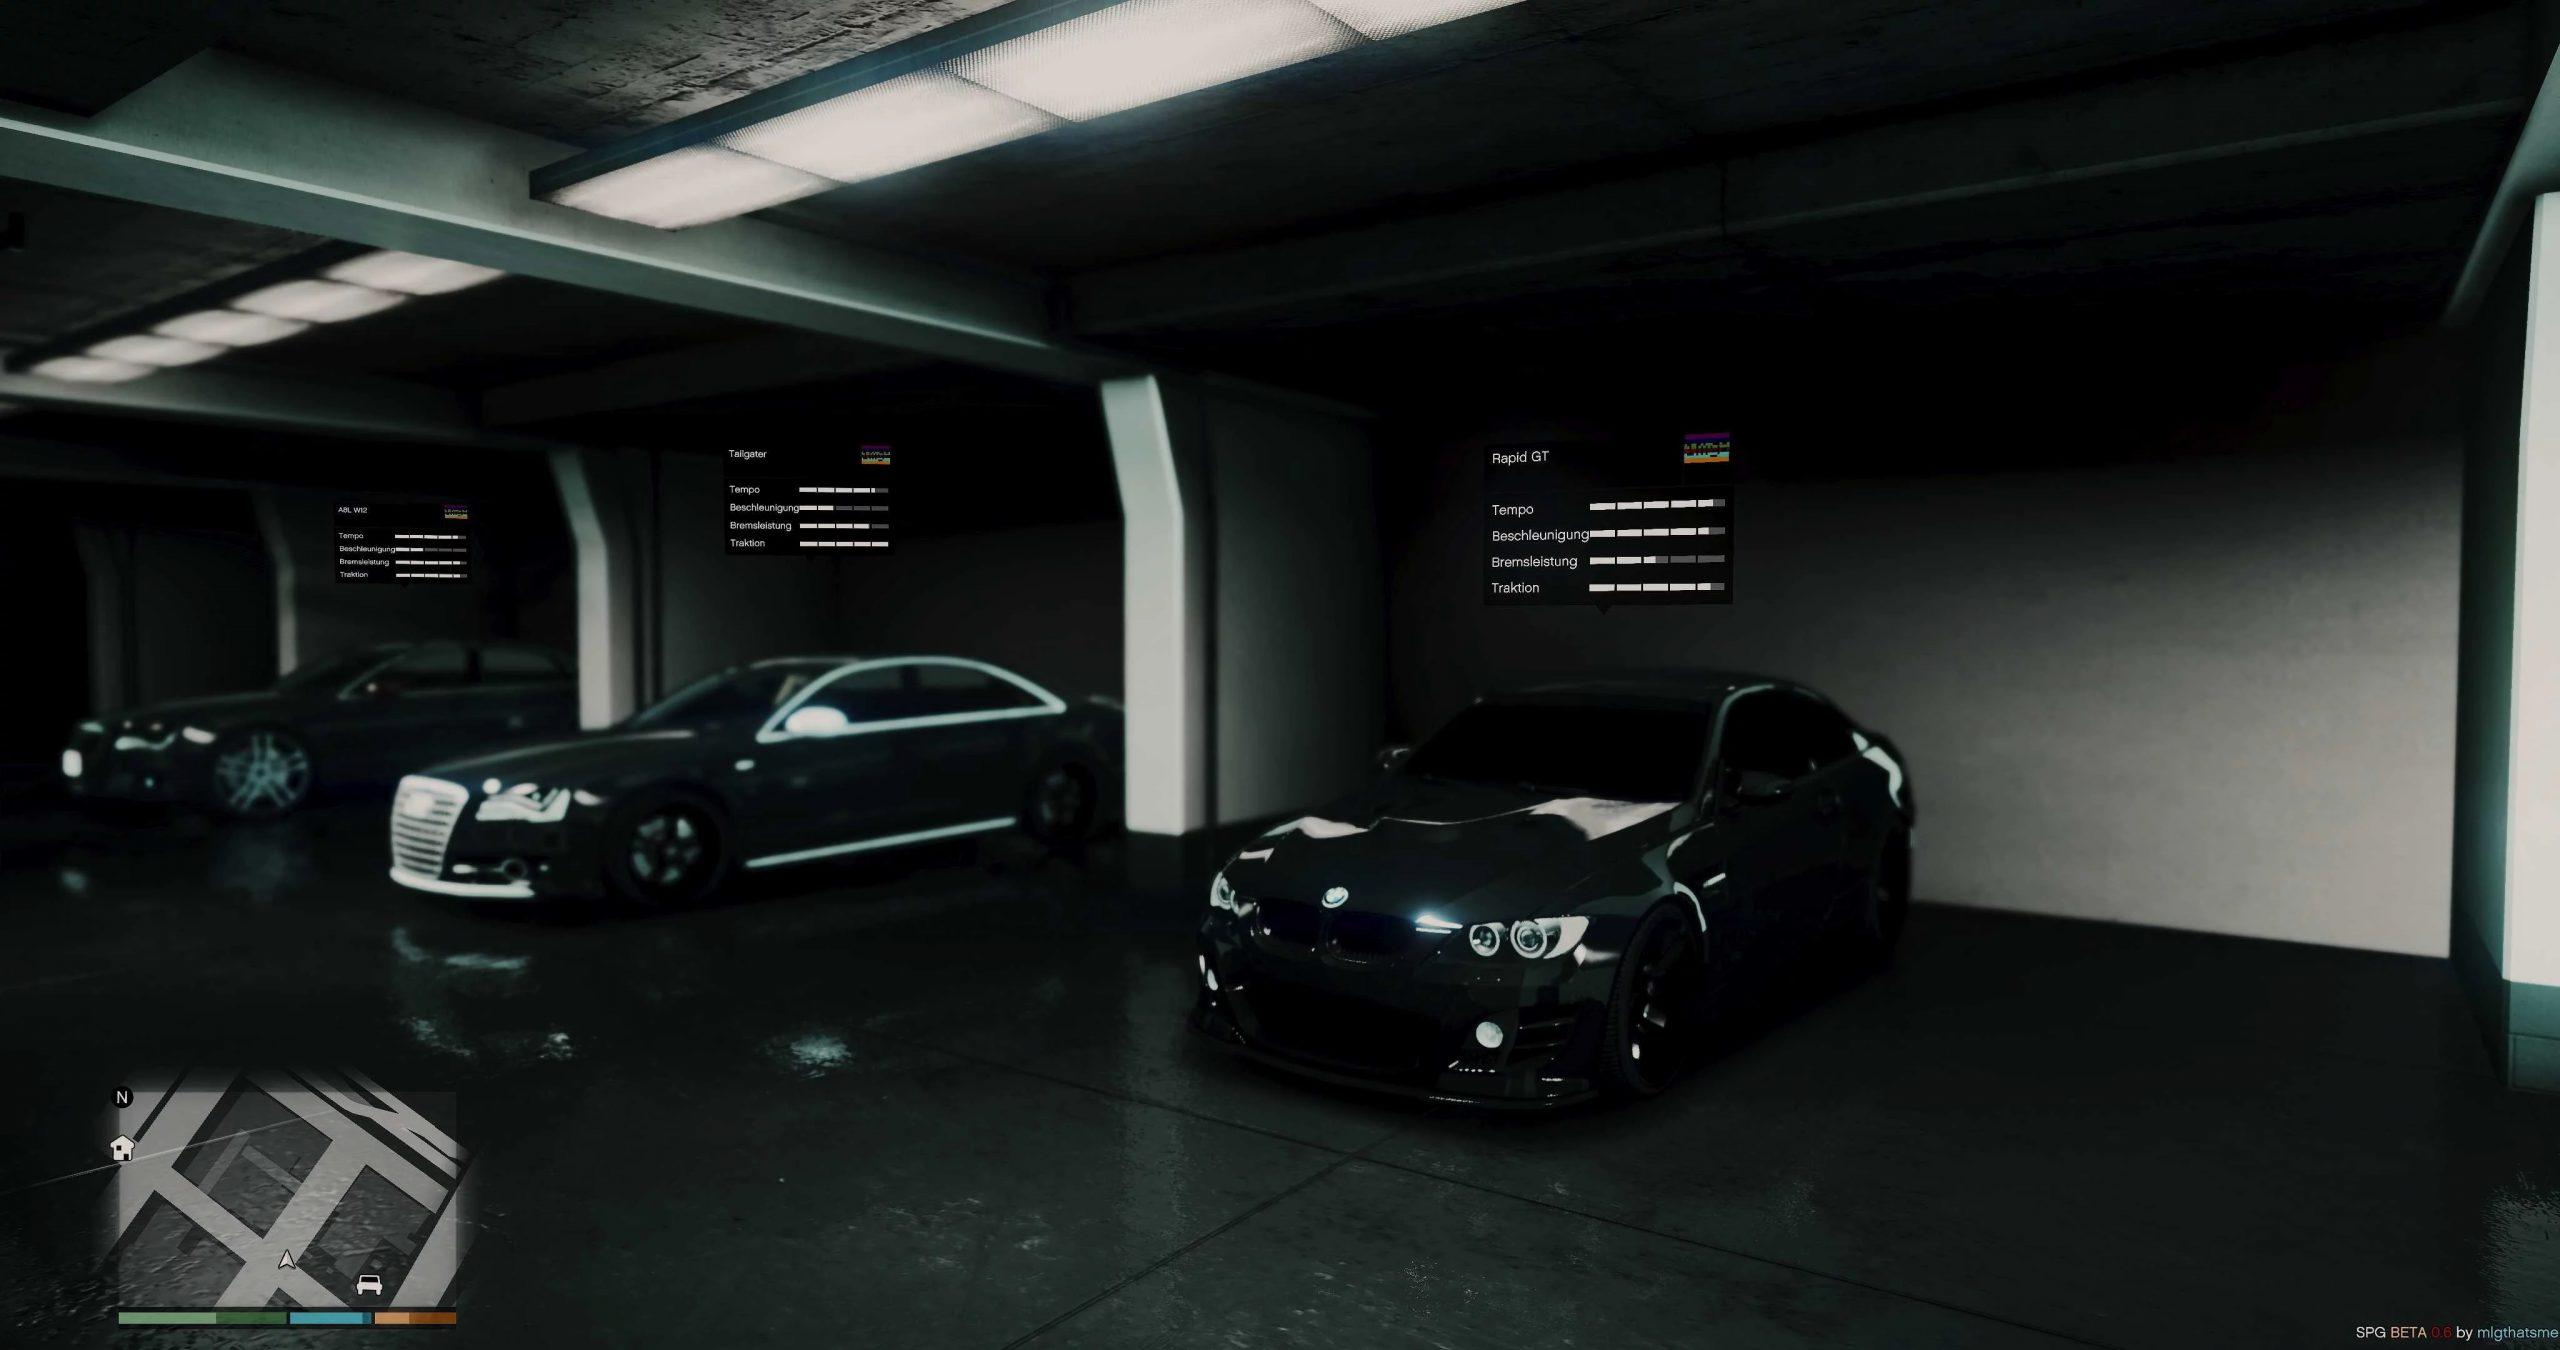 Luxury Garage Spg For 240 Cars Playboy Mansion 2 0 Gta5mod Net